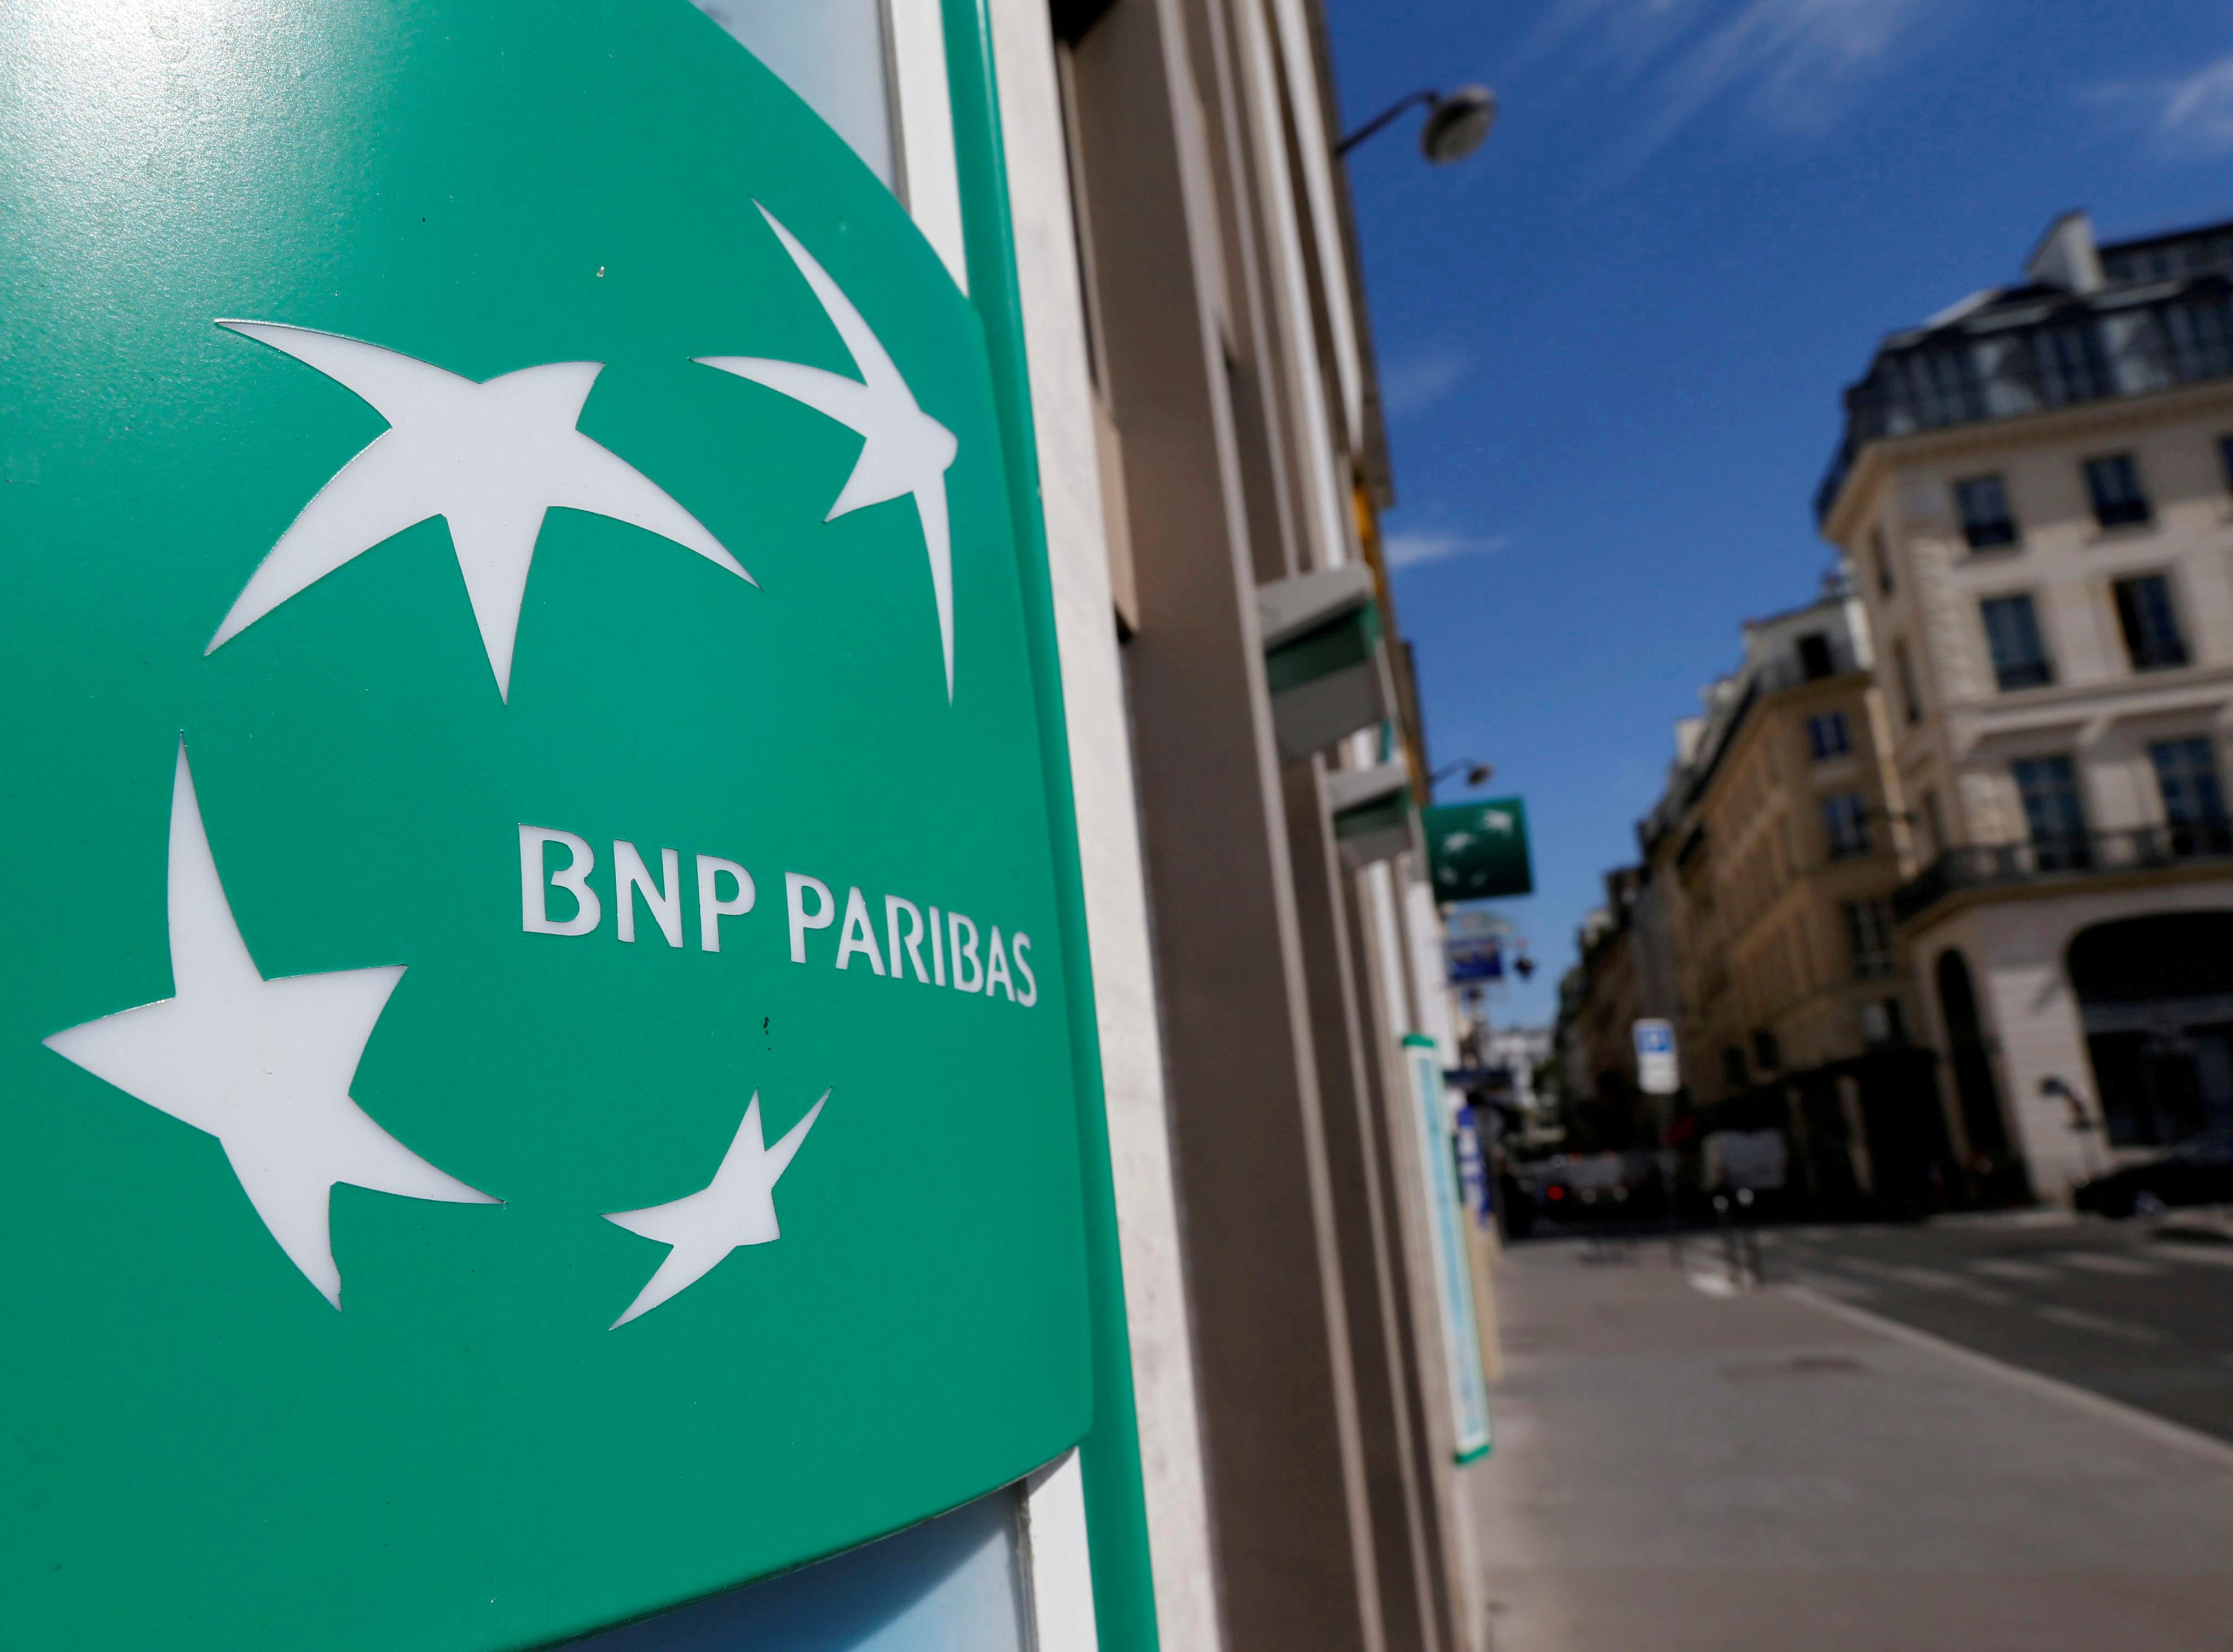 A BNP Paribas logo is seen outside a bank office in Paris, France, August 6, 2018.  REUTERS/Regis Duvignau/File Photo